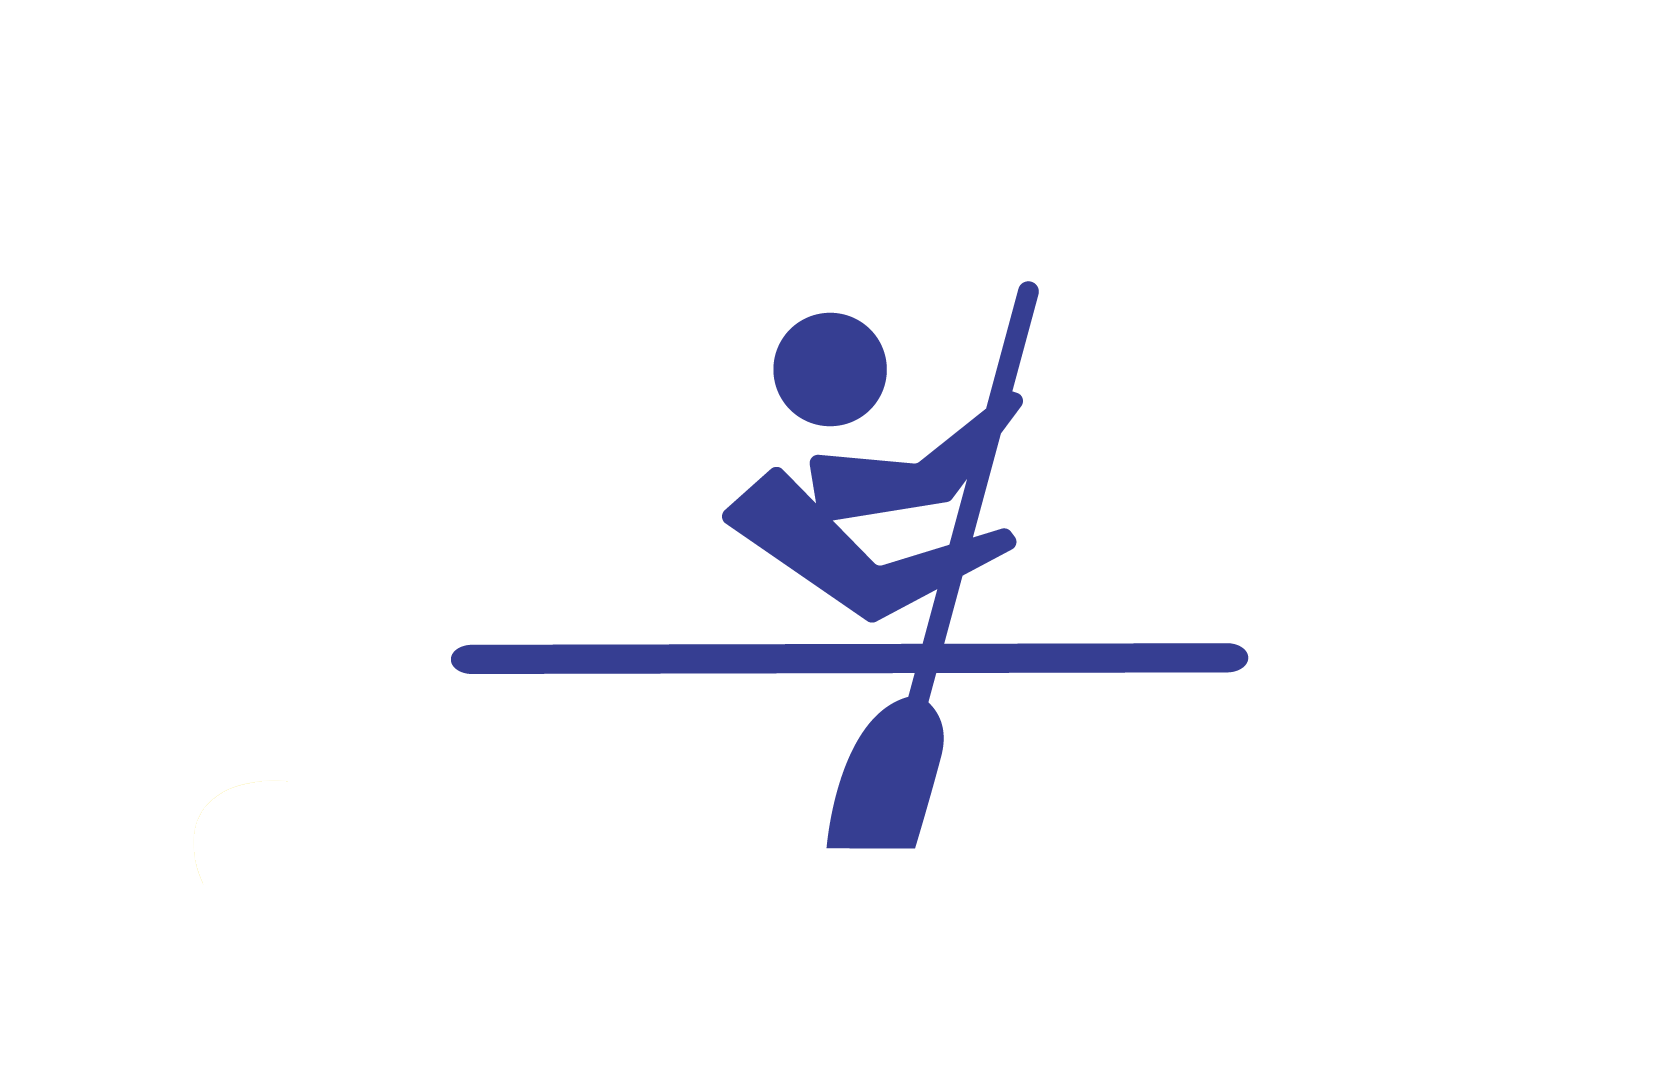 A imagem mostra o pictograma da modalidade